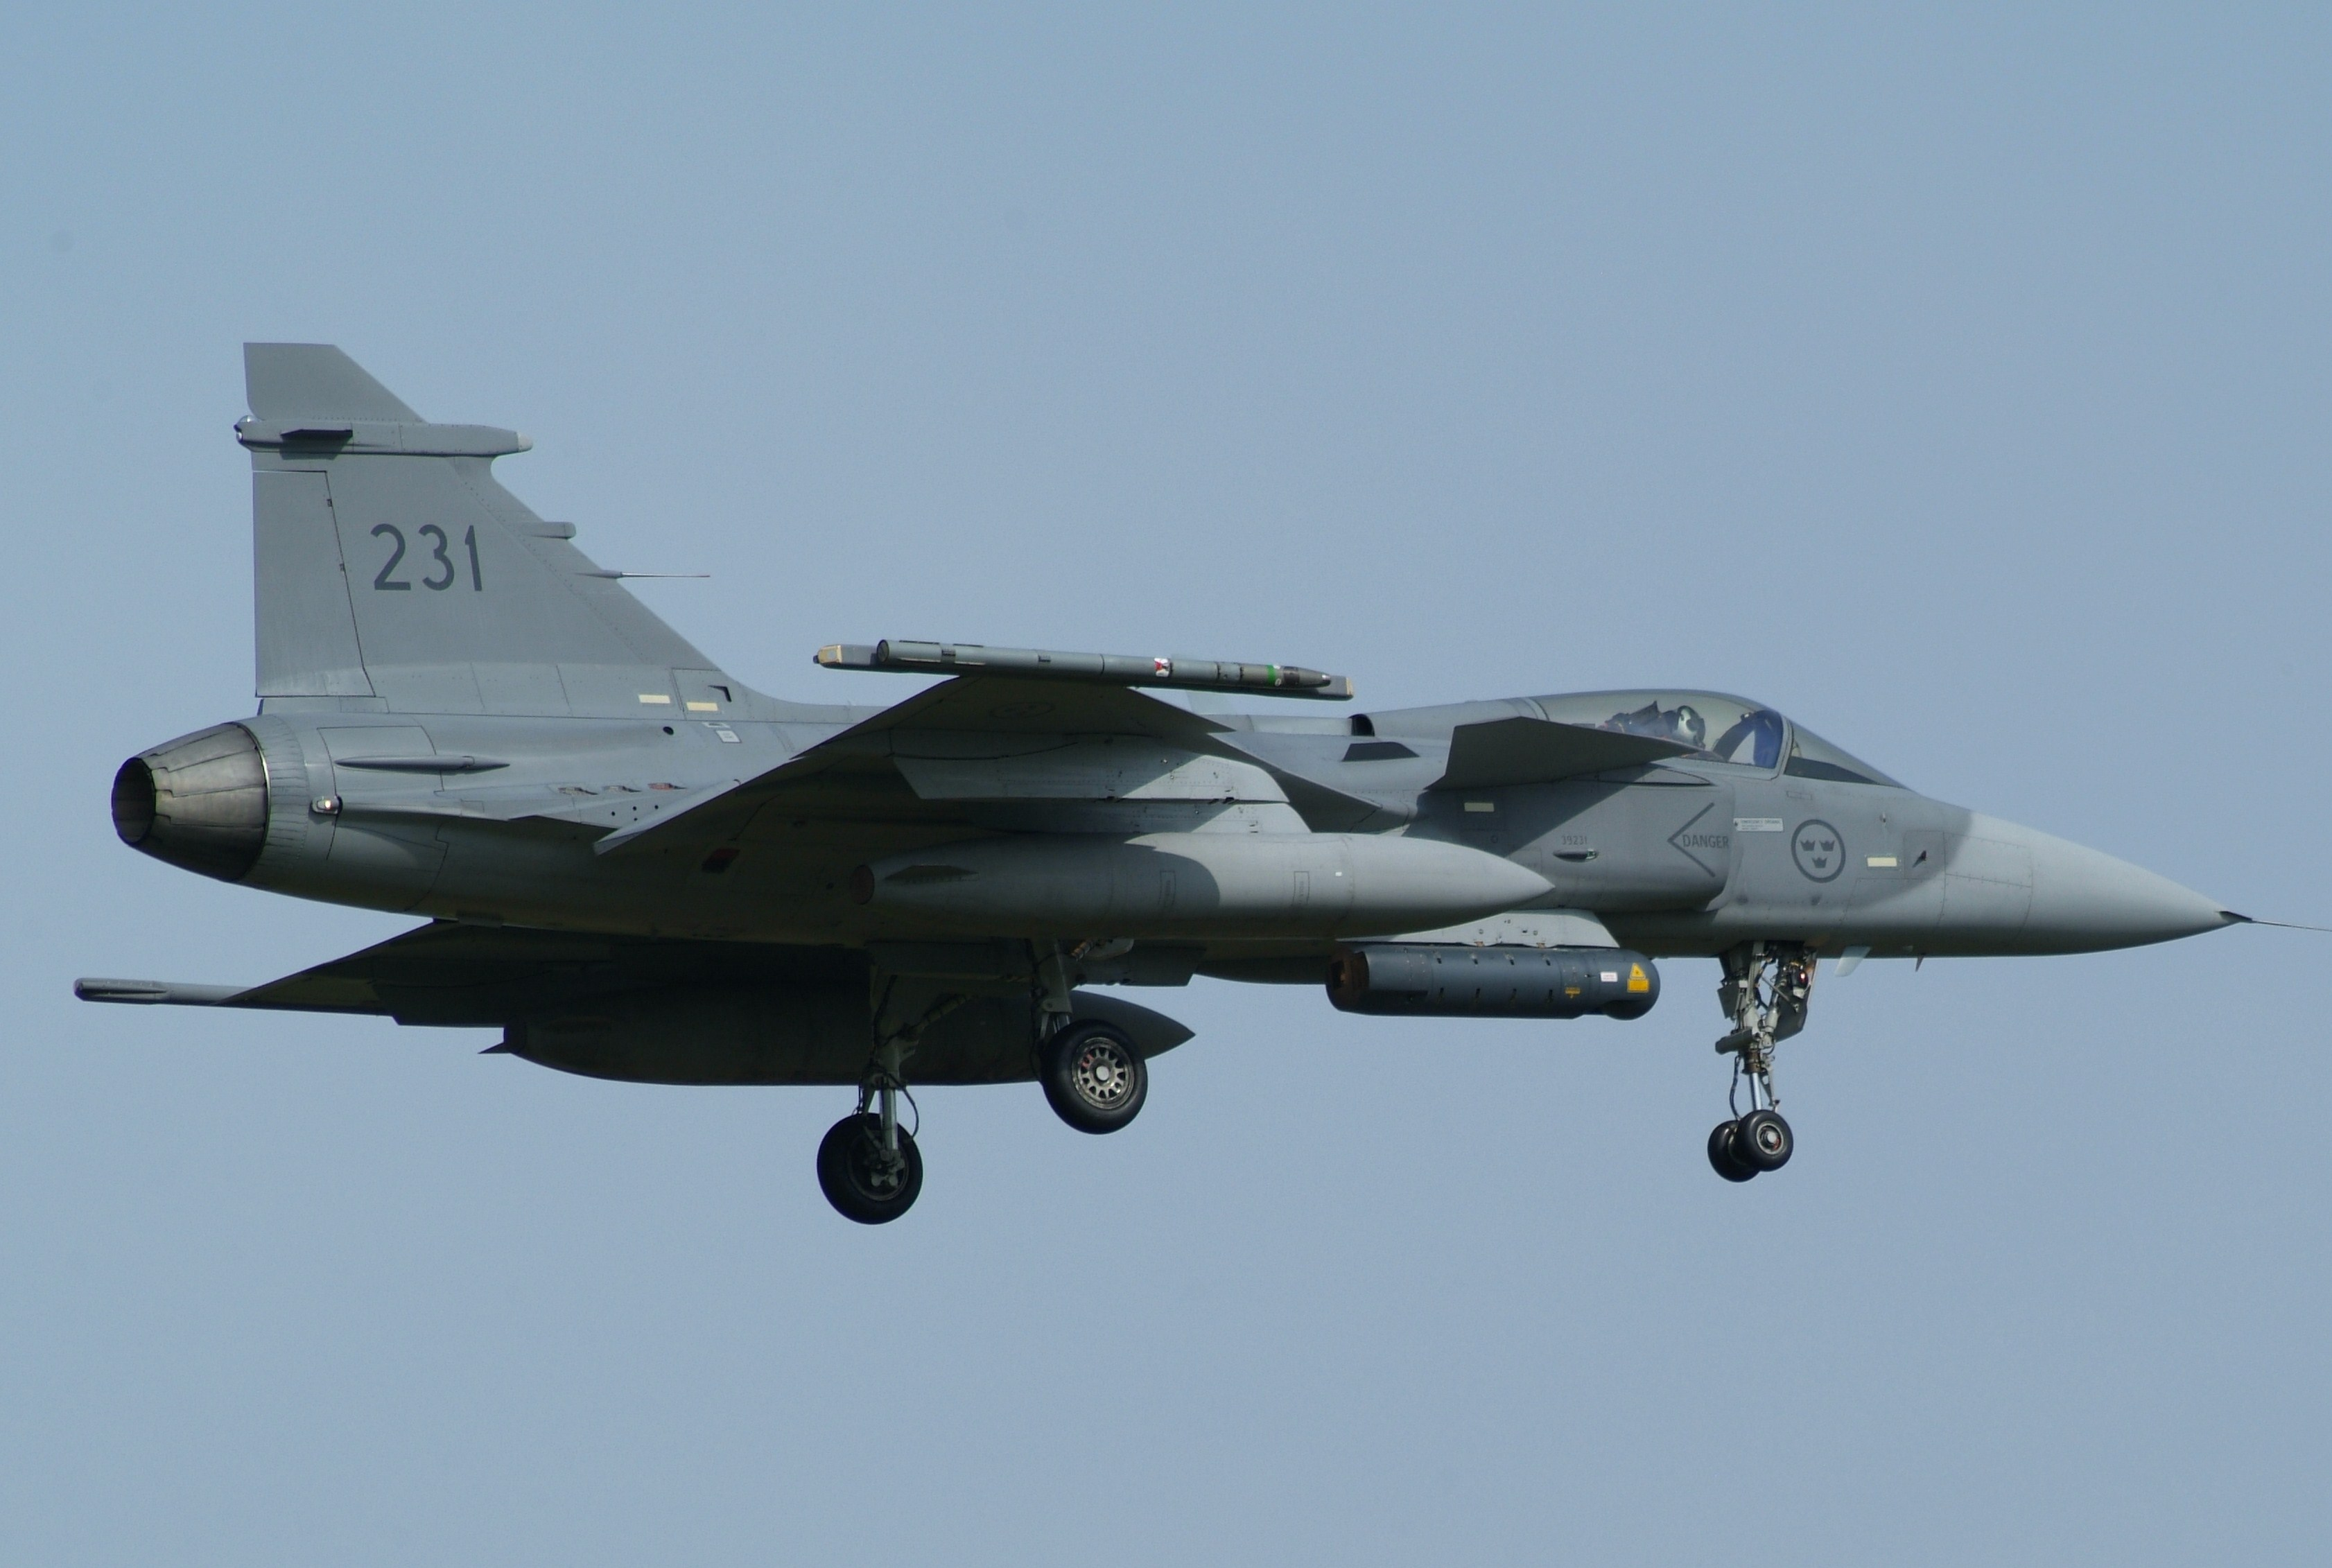 File 39231 Saab J 39c Gripen Of F21 Of The Swedish Air Force 4543631006 Jpg Wikimedia Commons